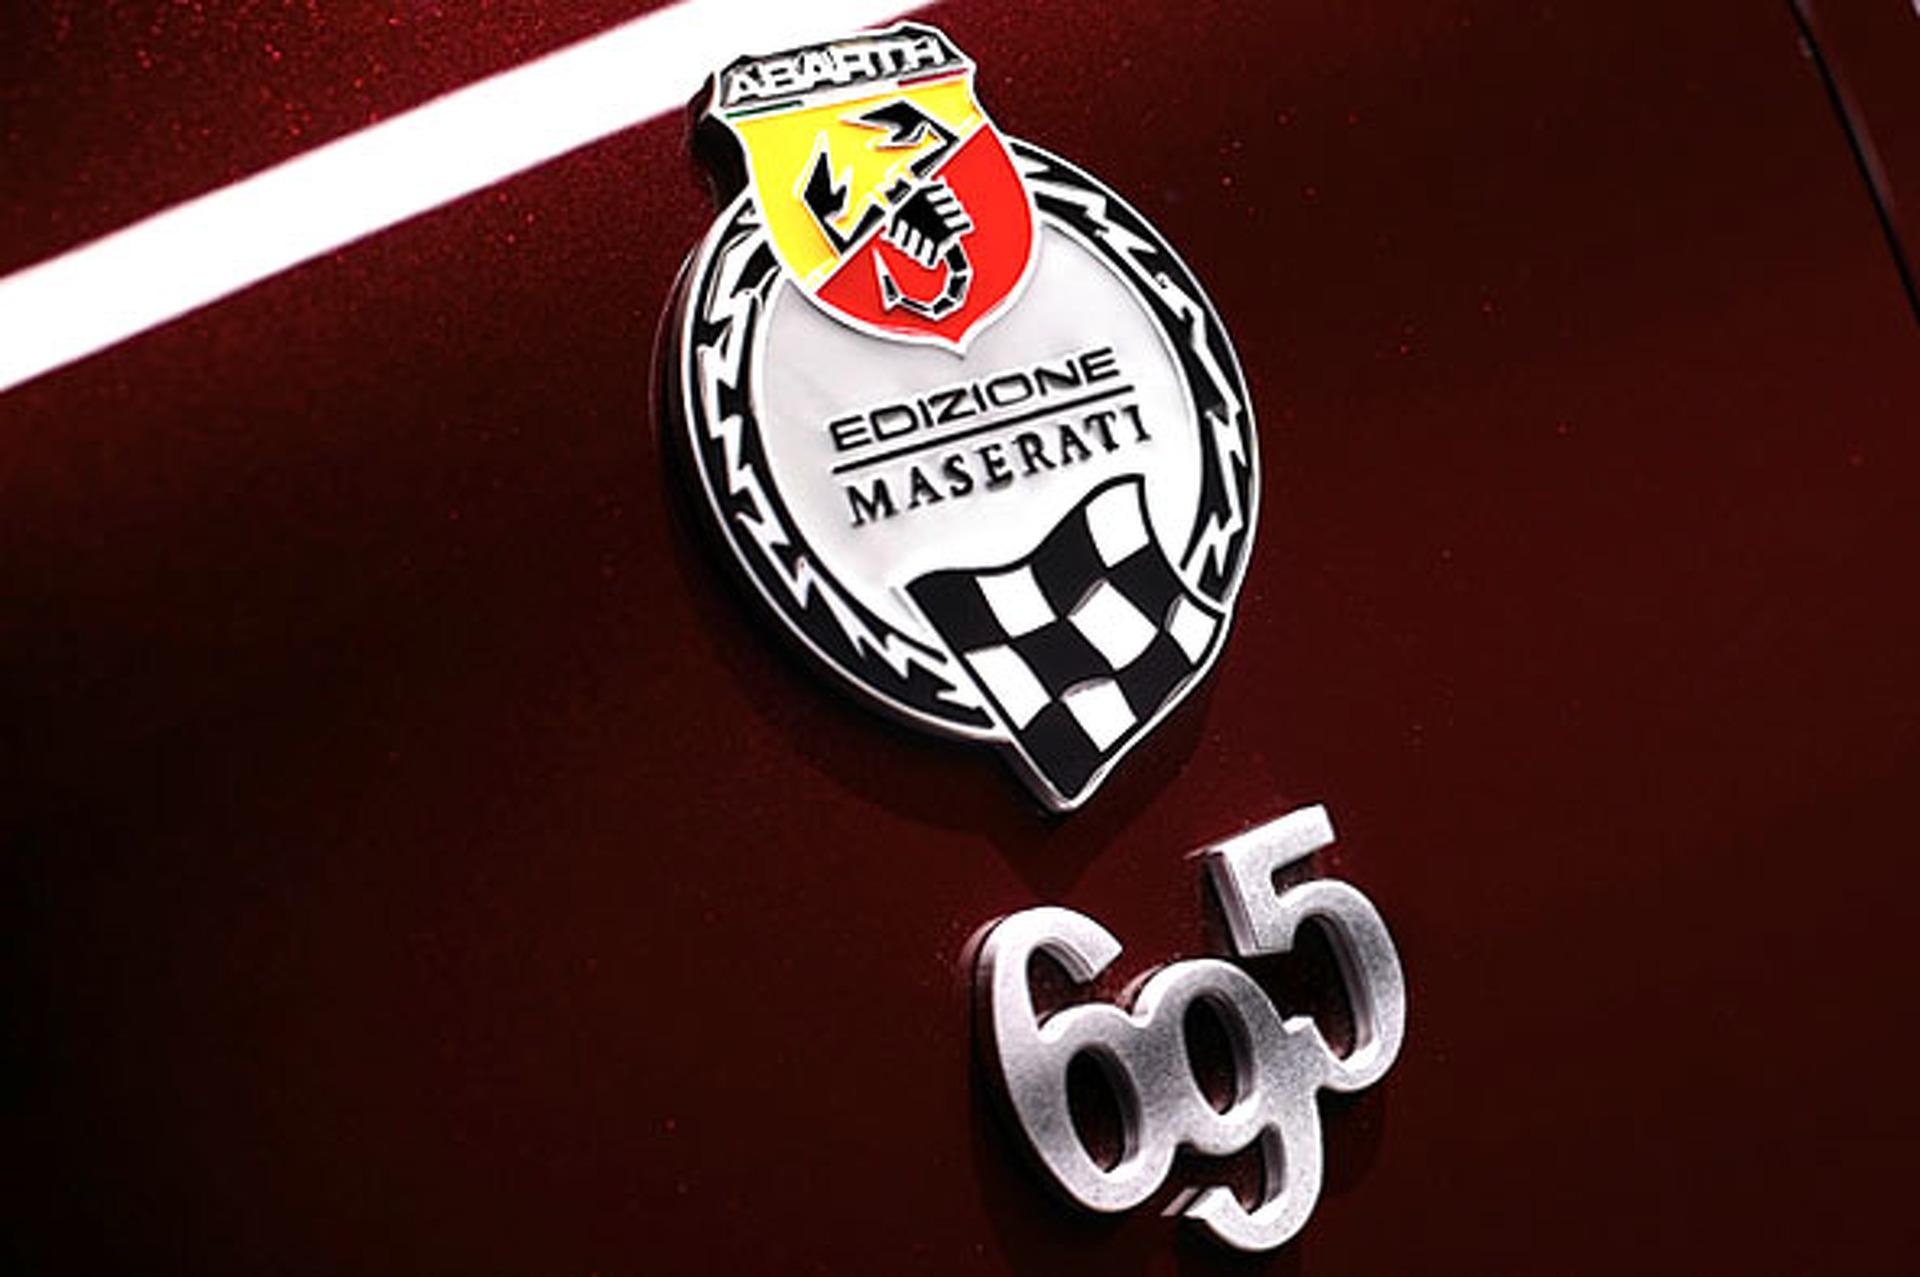 Unveiled: Abarth 695 Maserati Edition